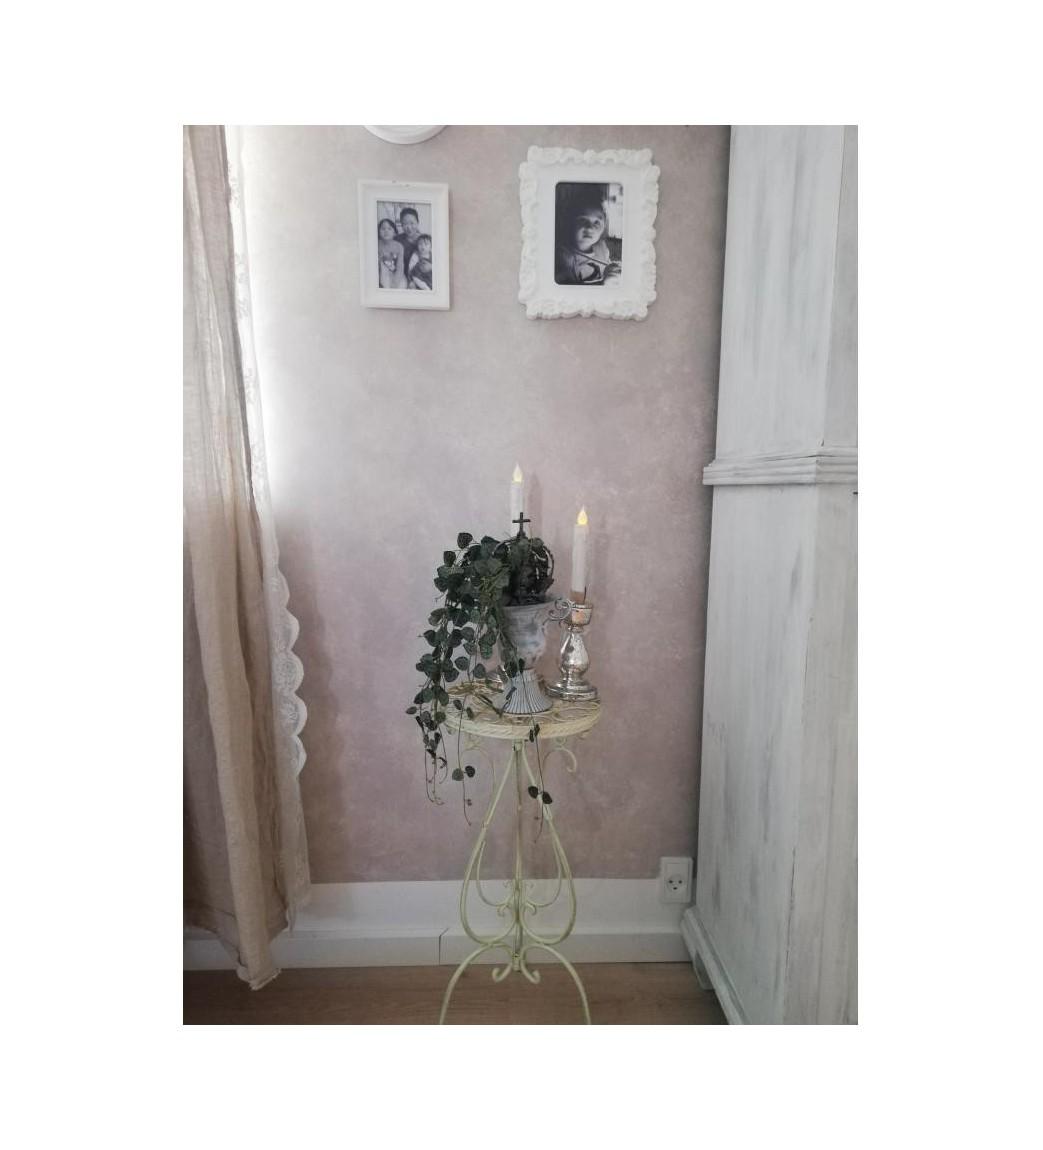 Creme bord med liljer Ø: 26 cm.  - 1